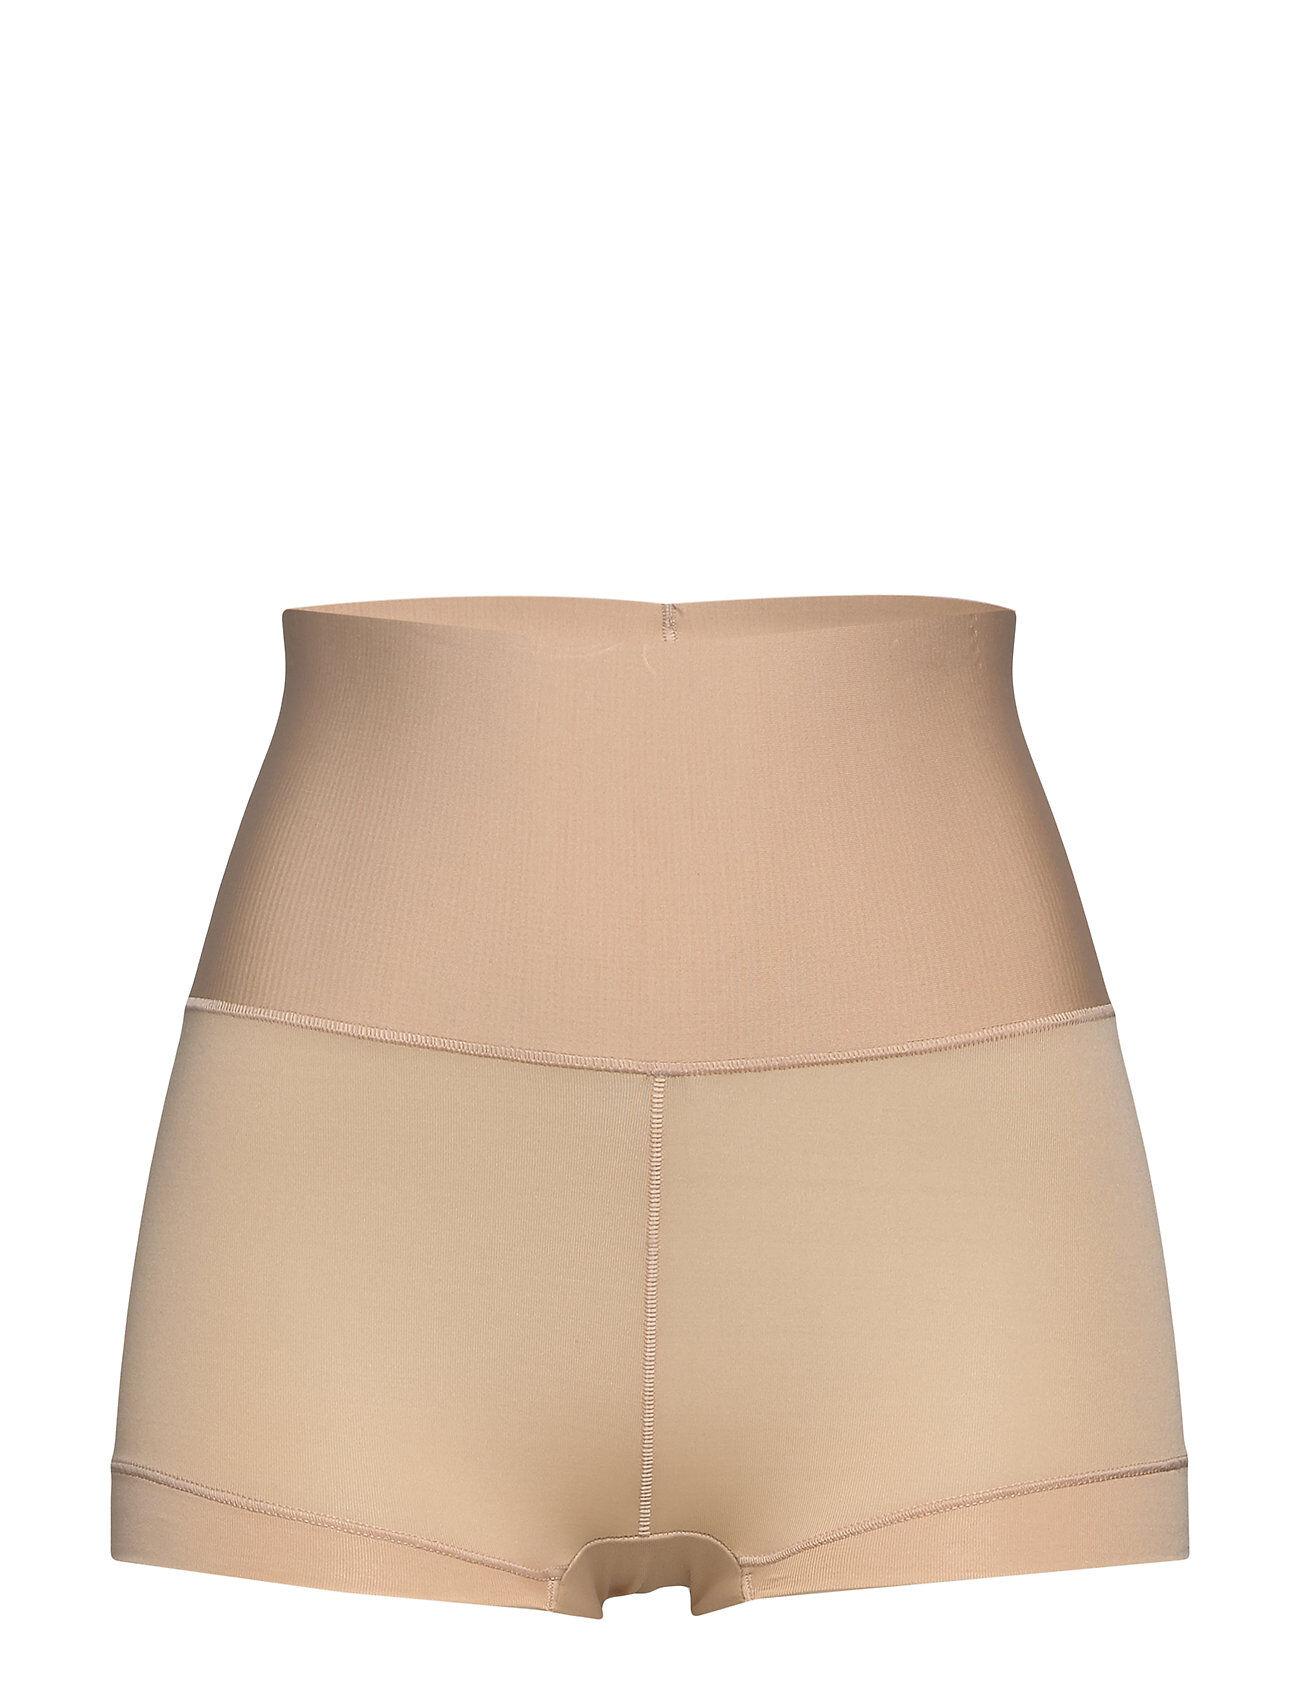 Maidenform Tame Your Tummy Missy Lingerie Shapewear Bottoms Beige Maidenform